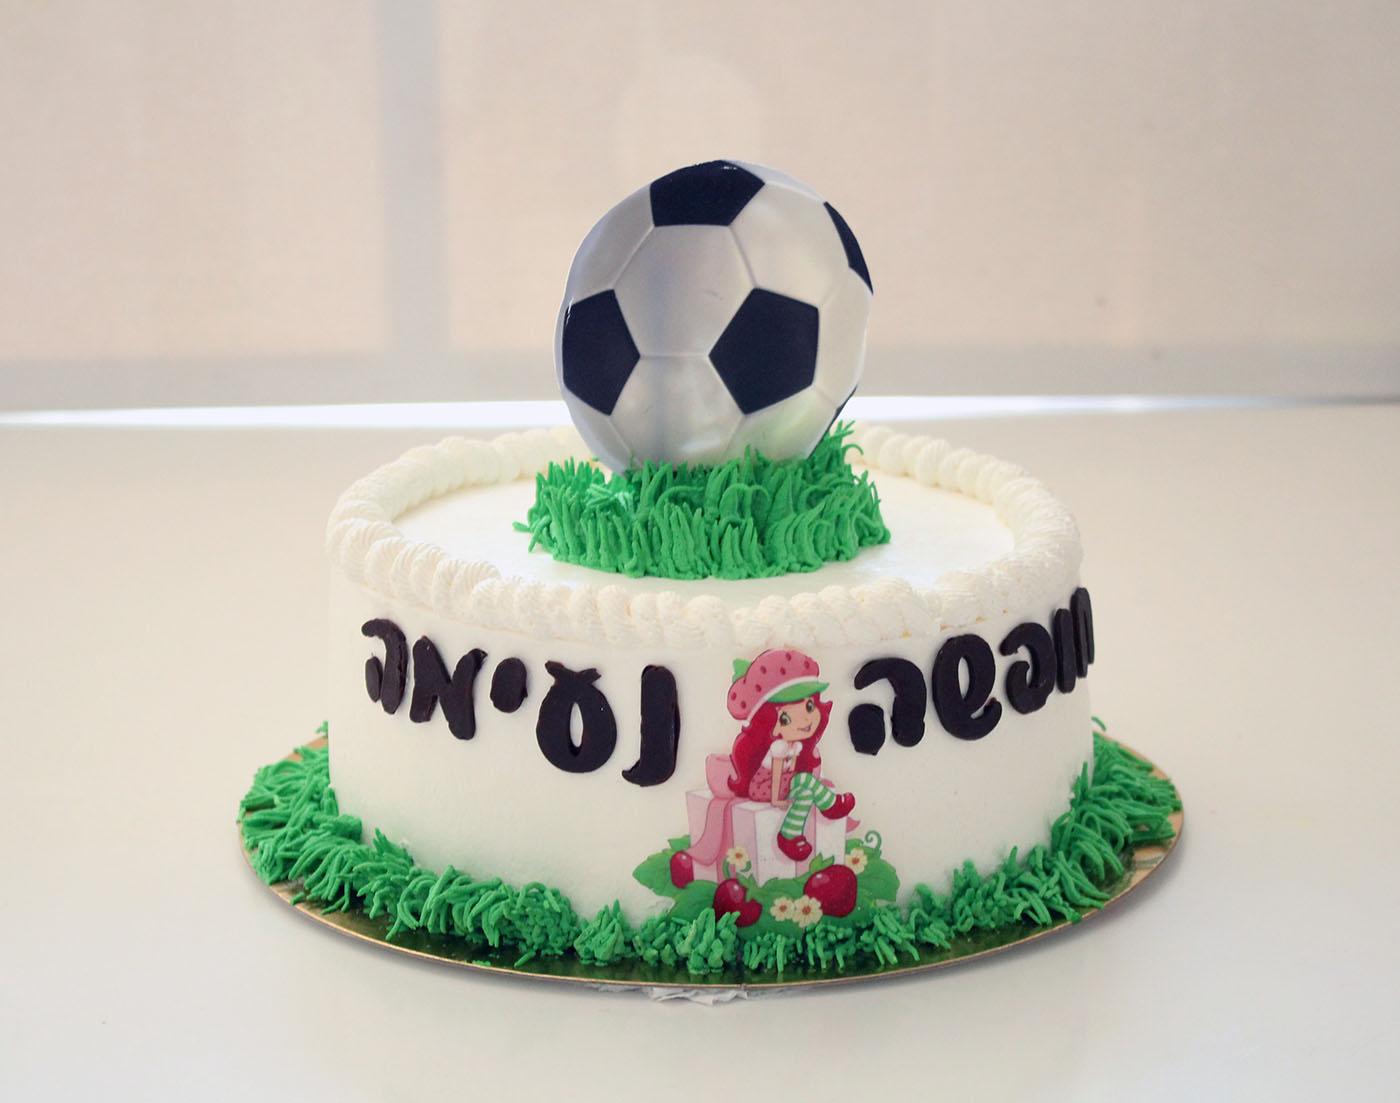 IMG 9381 - עוגת זילוף